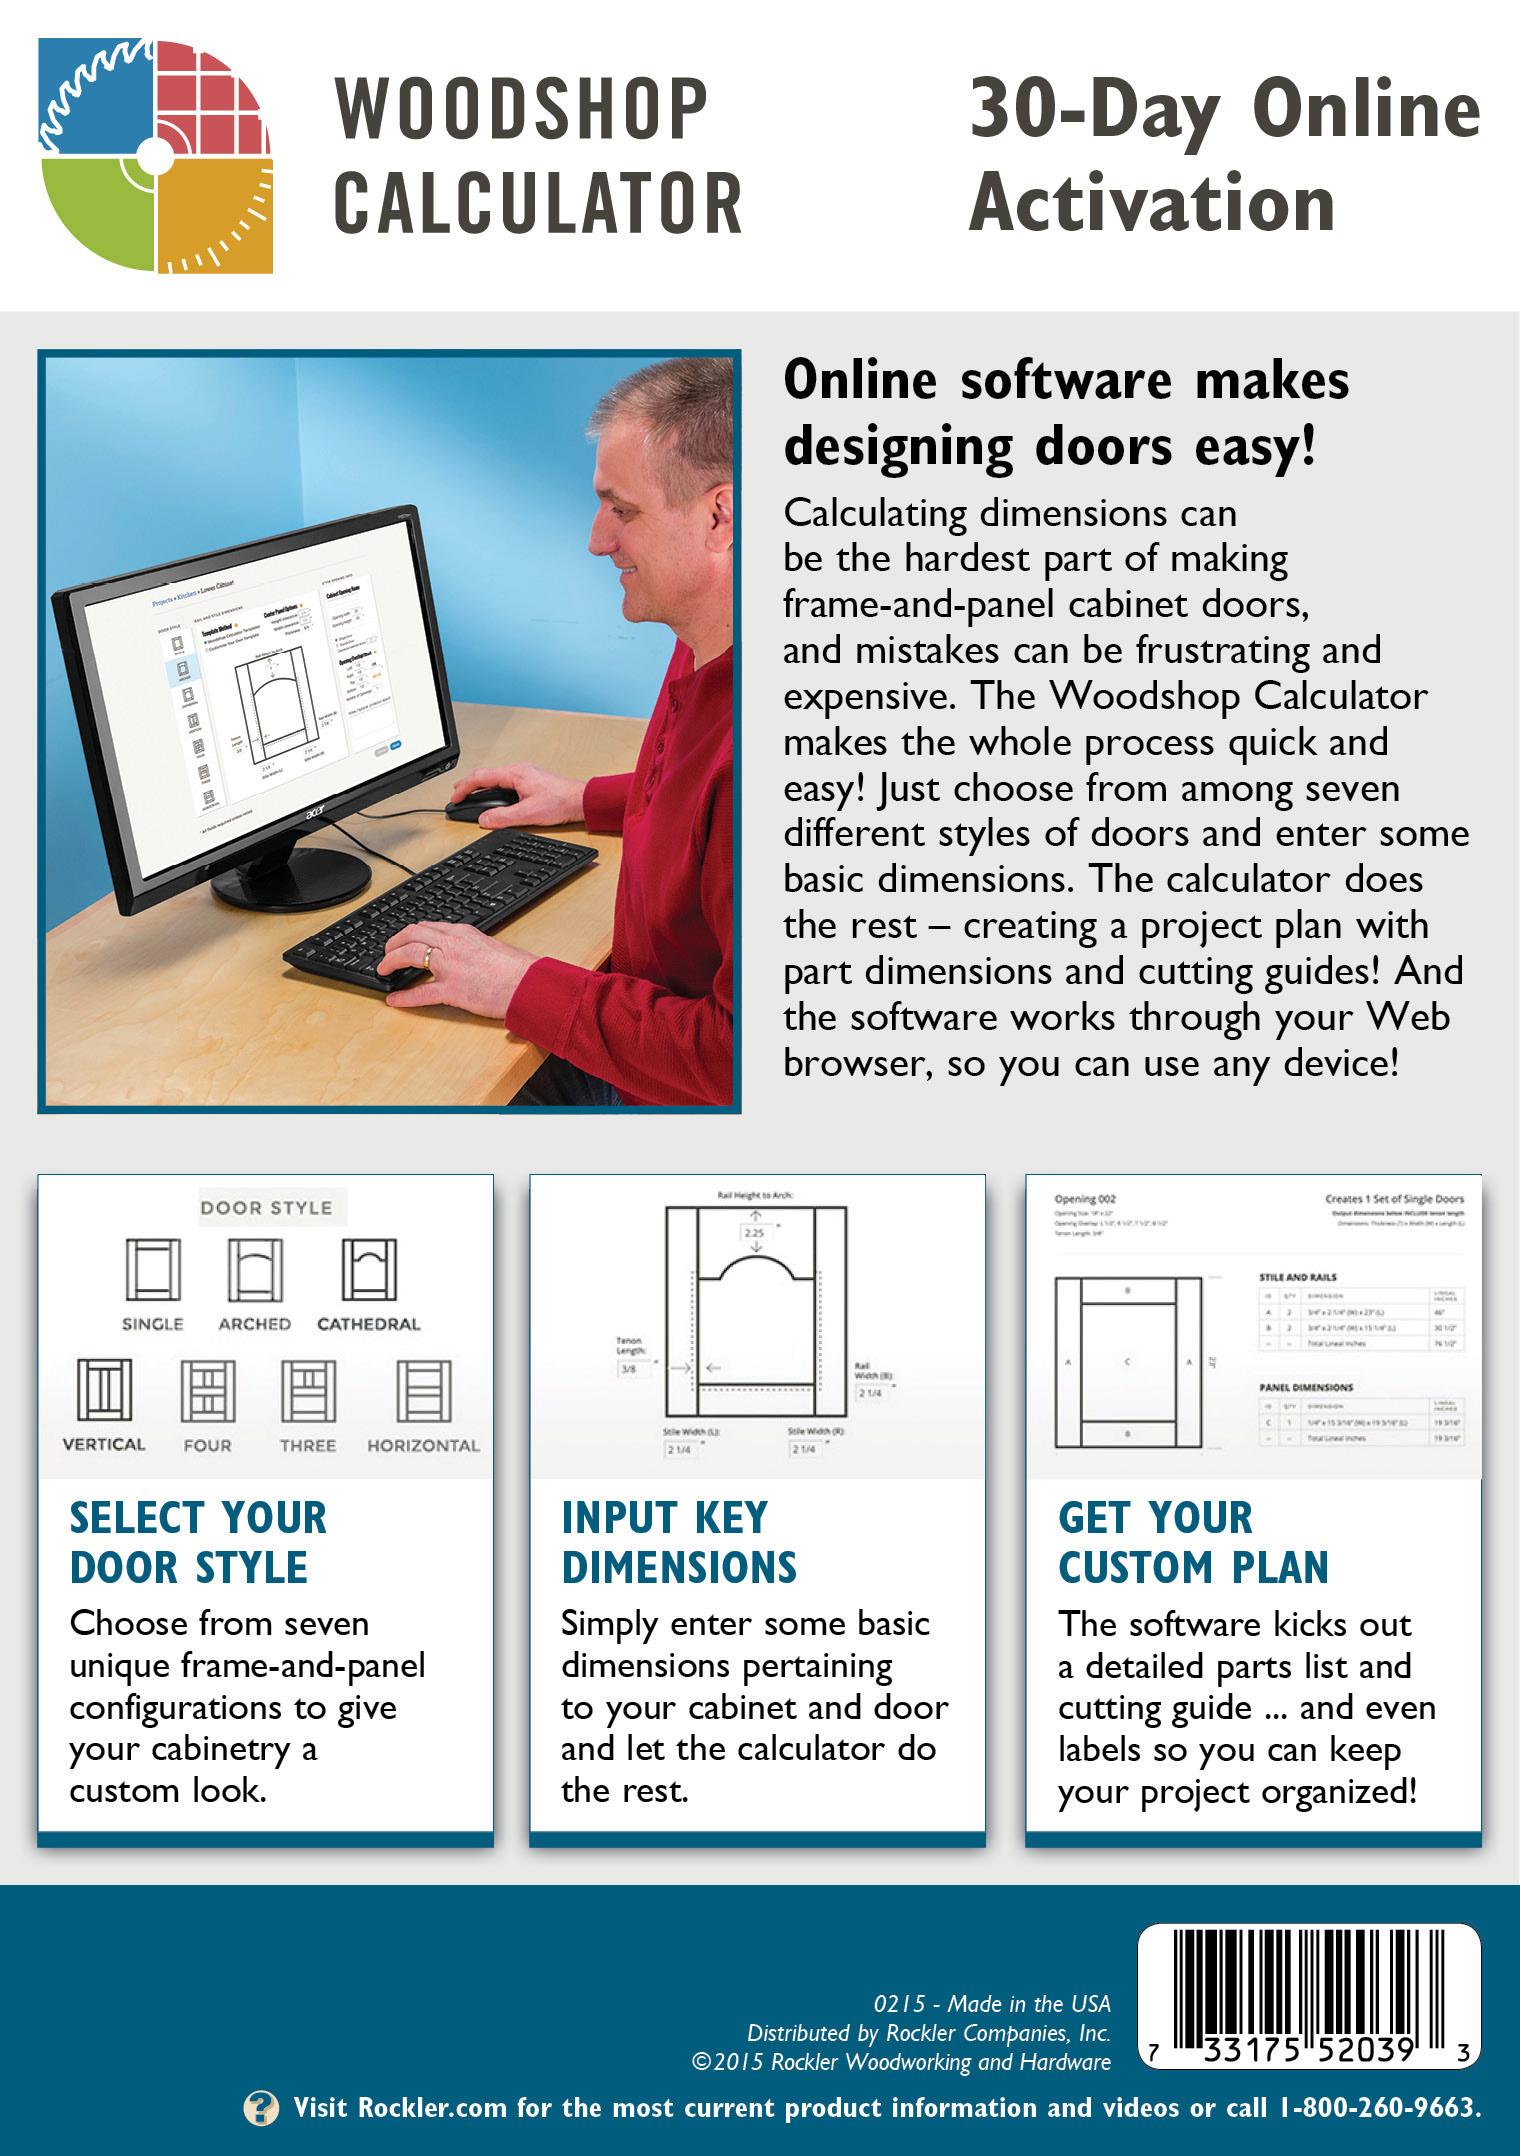 Rockler Launches Web App To Simplify Cabinet Door-Making